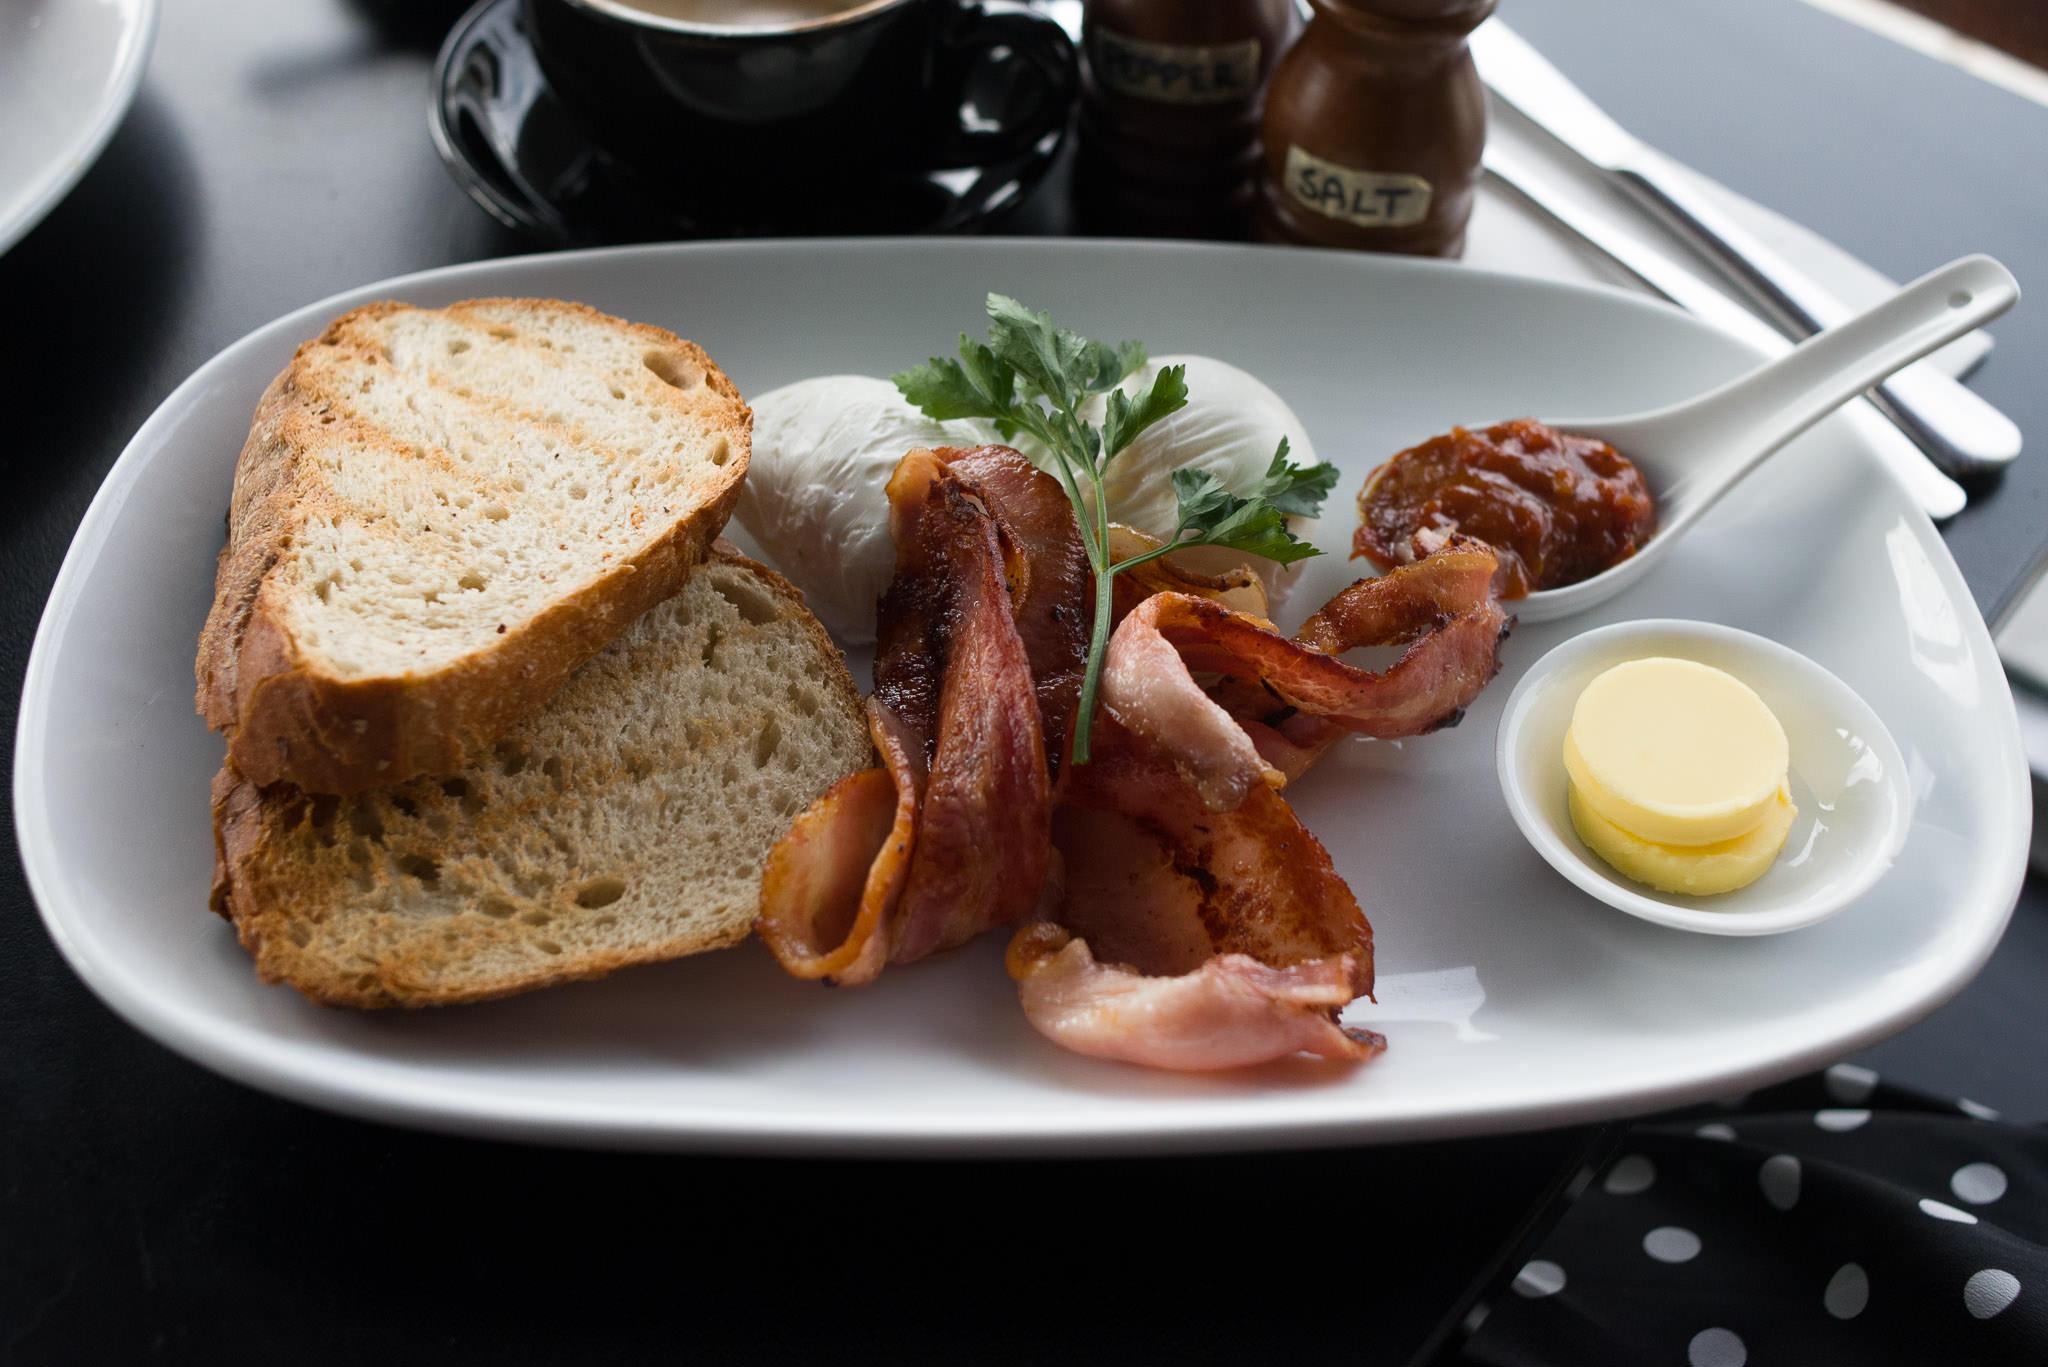 Poached eggs on toast (AU$11) plus a side of bacon (AU$5.50)